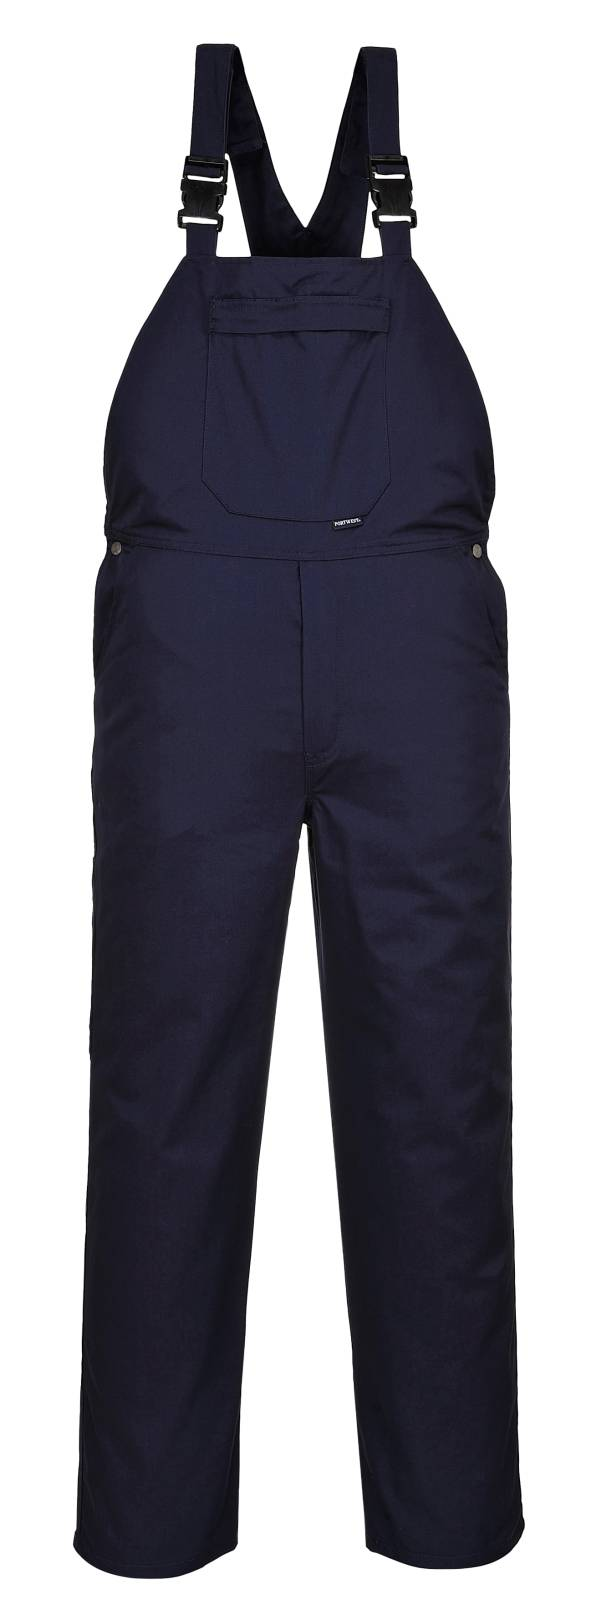 Portwest Amerikaanse overalls C875 marineblauw(NA)